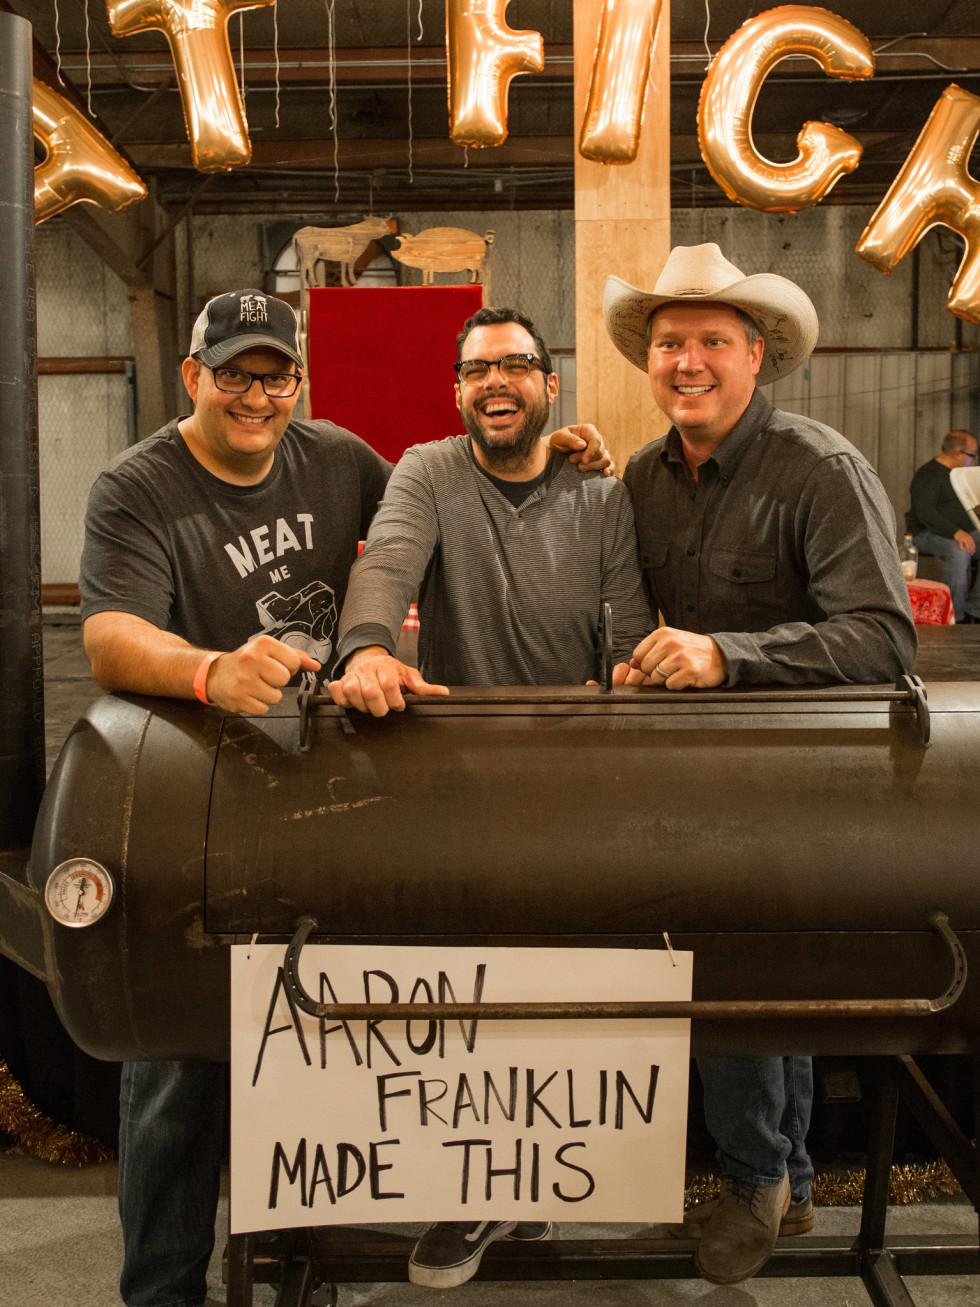 Daniel Vaughn, Aaron Franklin at Meat Fight 2015